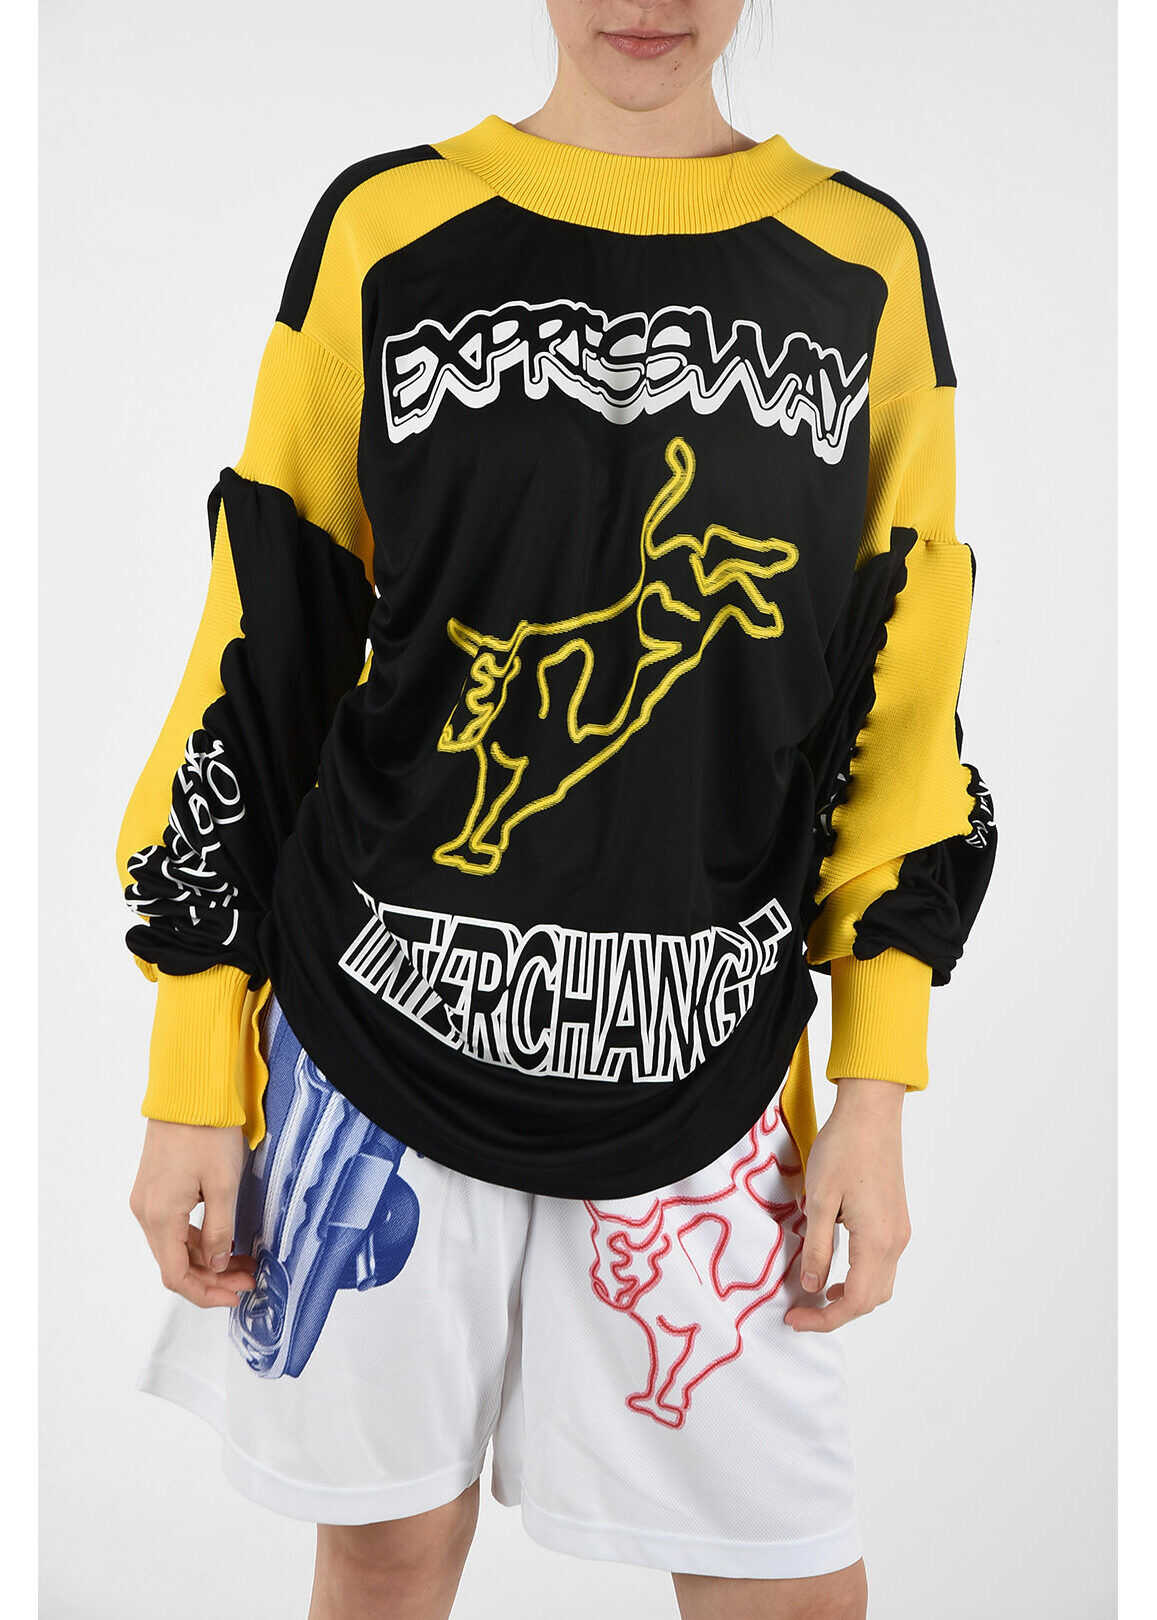 Calvin Klein EST.1978 JEANS printed sweatshirt YELLOW